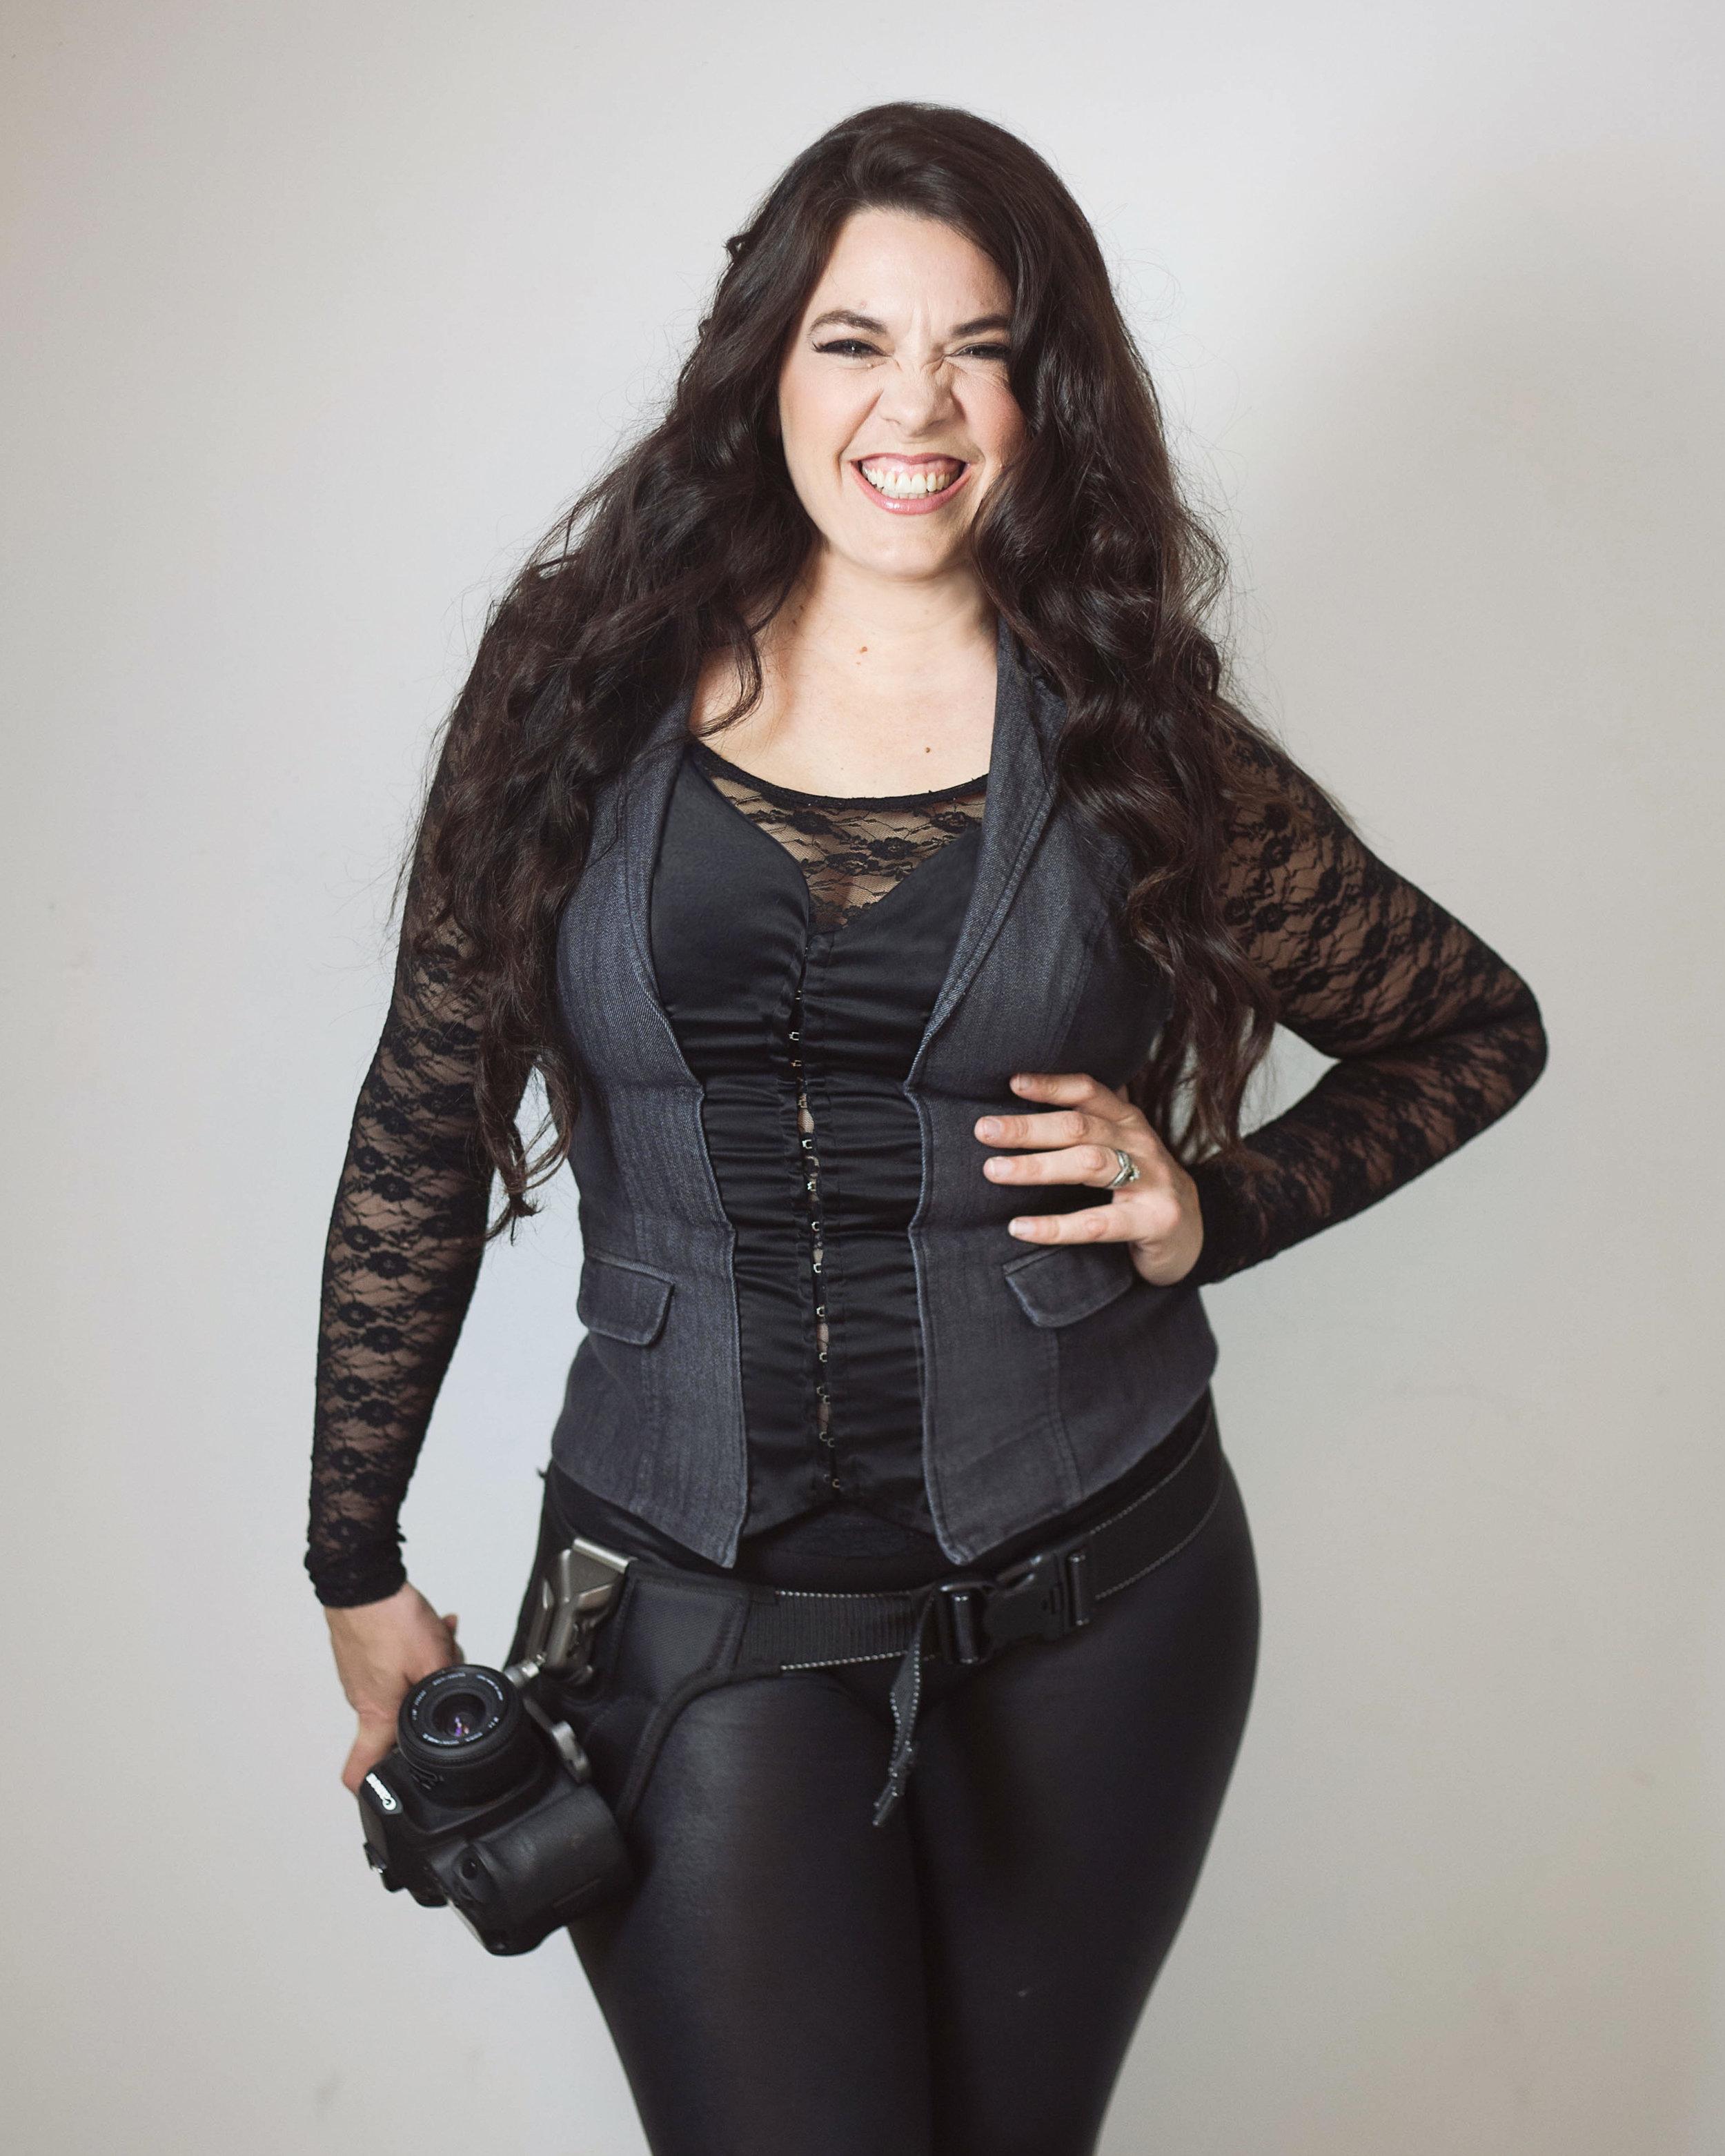 professional photographer asheville portrait branding chic magazine style